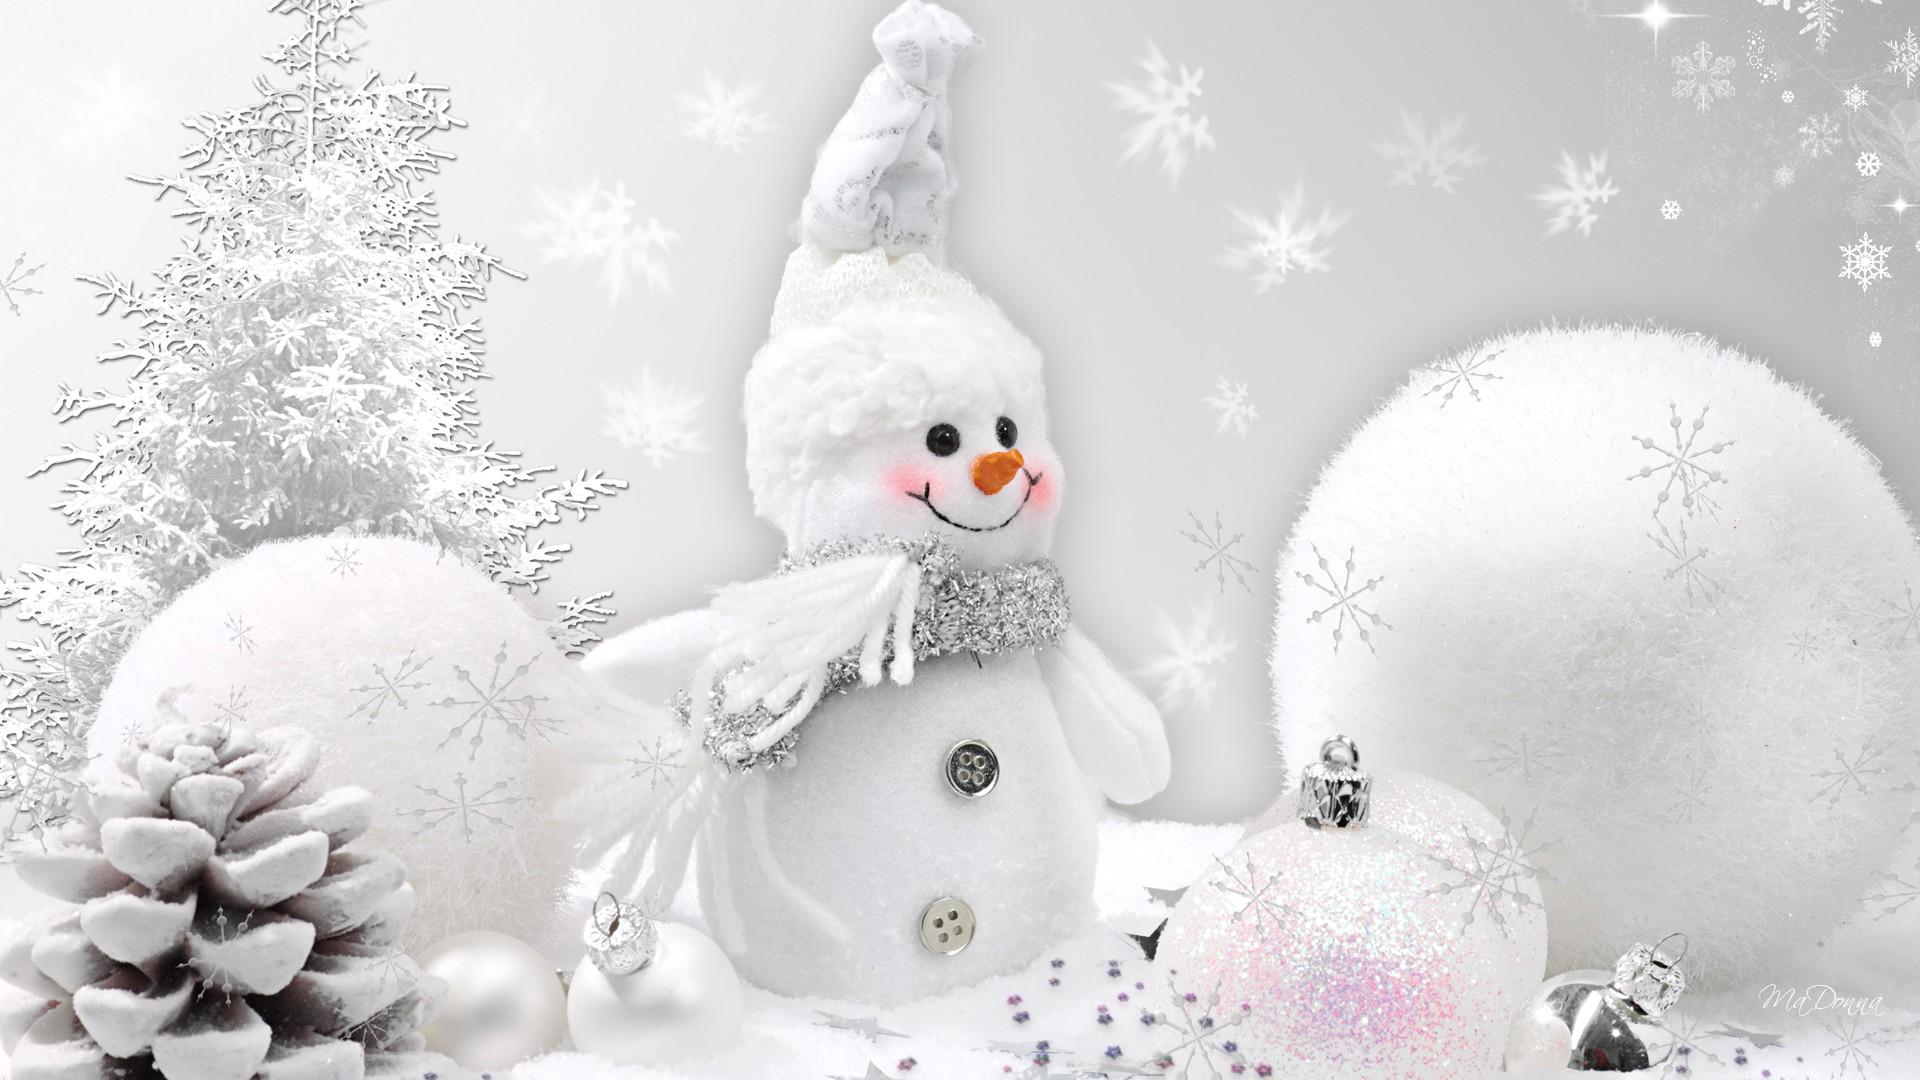 Christmas HD Wallpaper   Background Image   1920x1080   ID ...